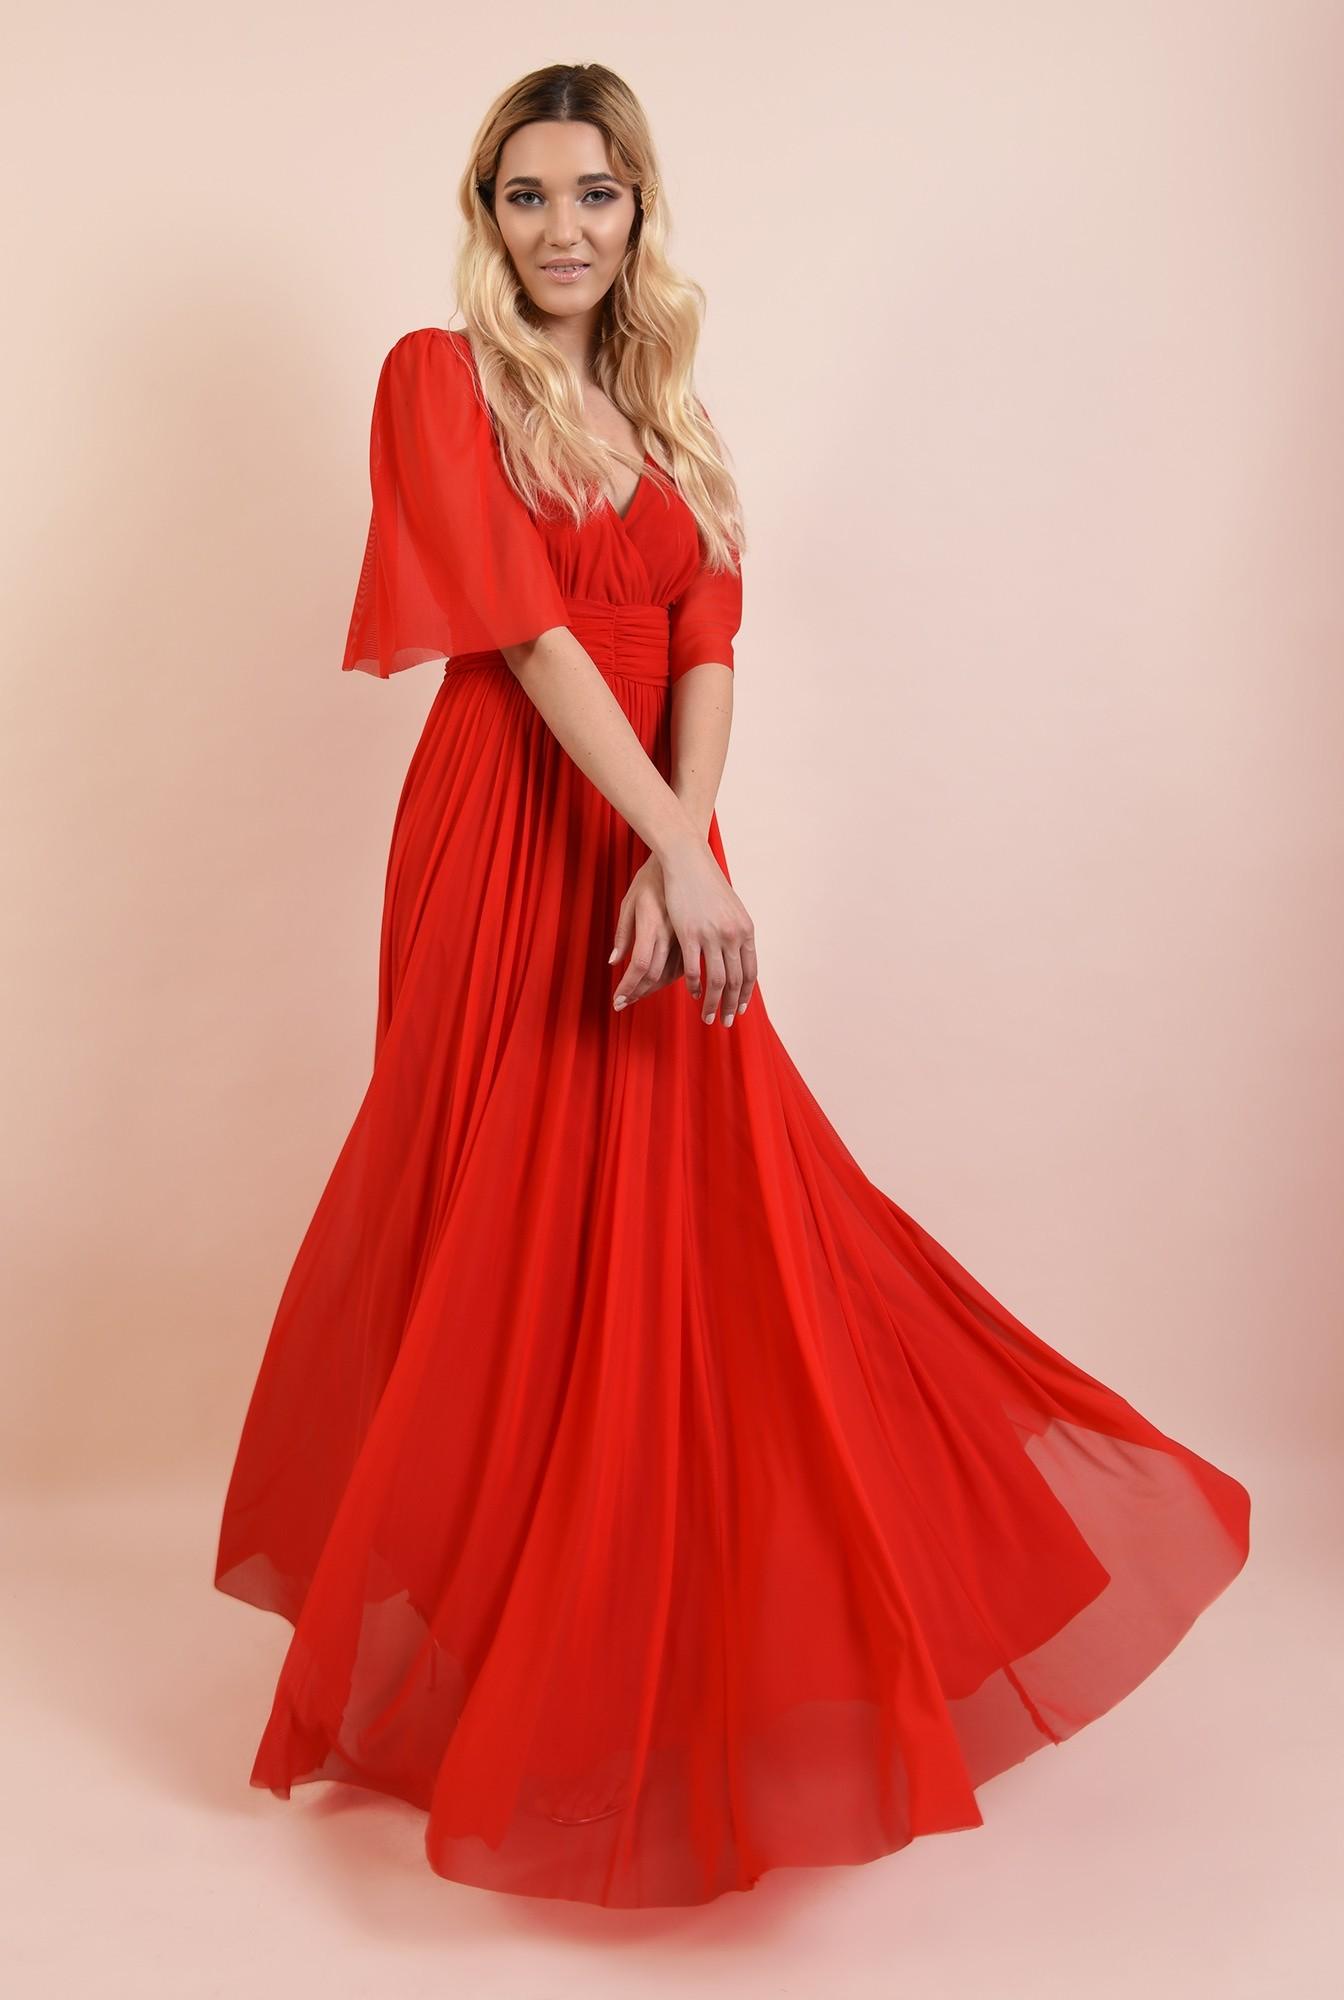 0 - rochie rosie, lunga, de seara, anchior, evazata, maneci fluture, Poema